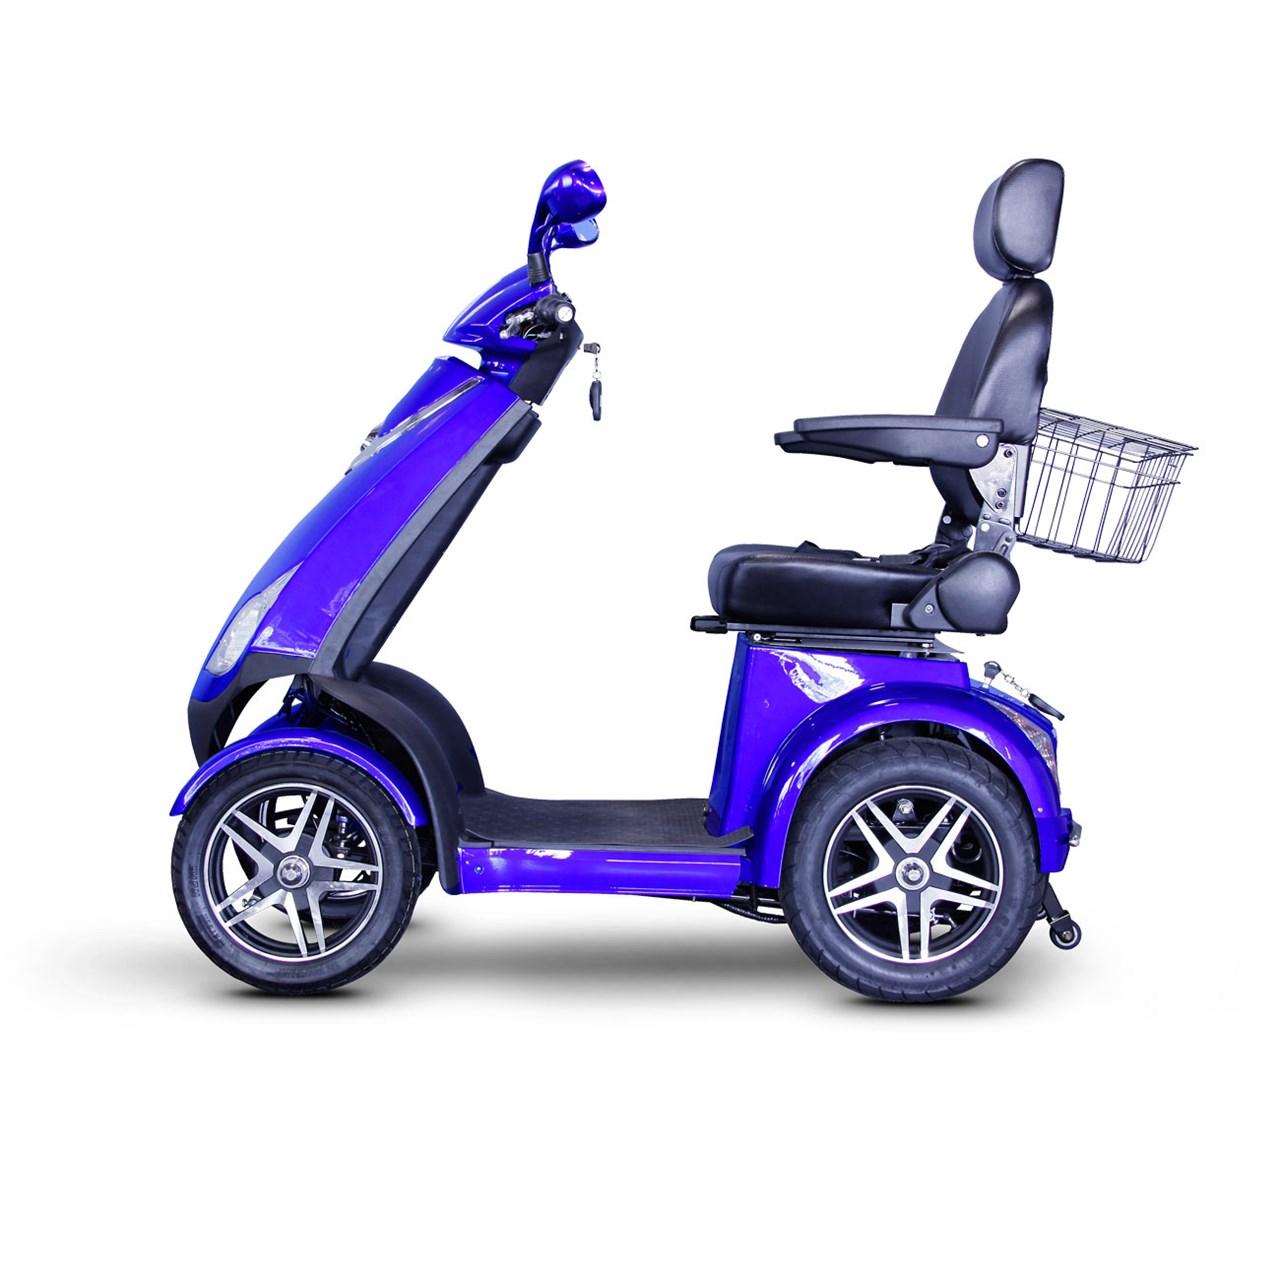 Maxiaids E Wheels Ew 72 4 Wheel Electric Senior Mobility Scooter Blue